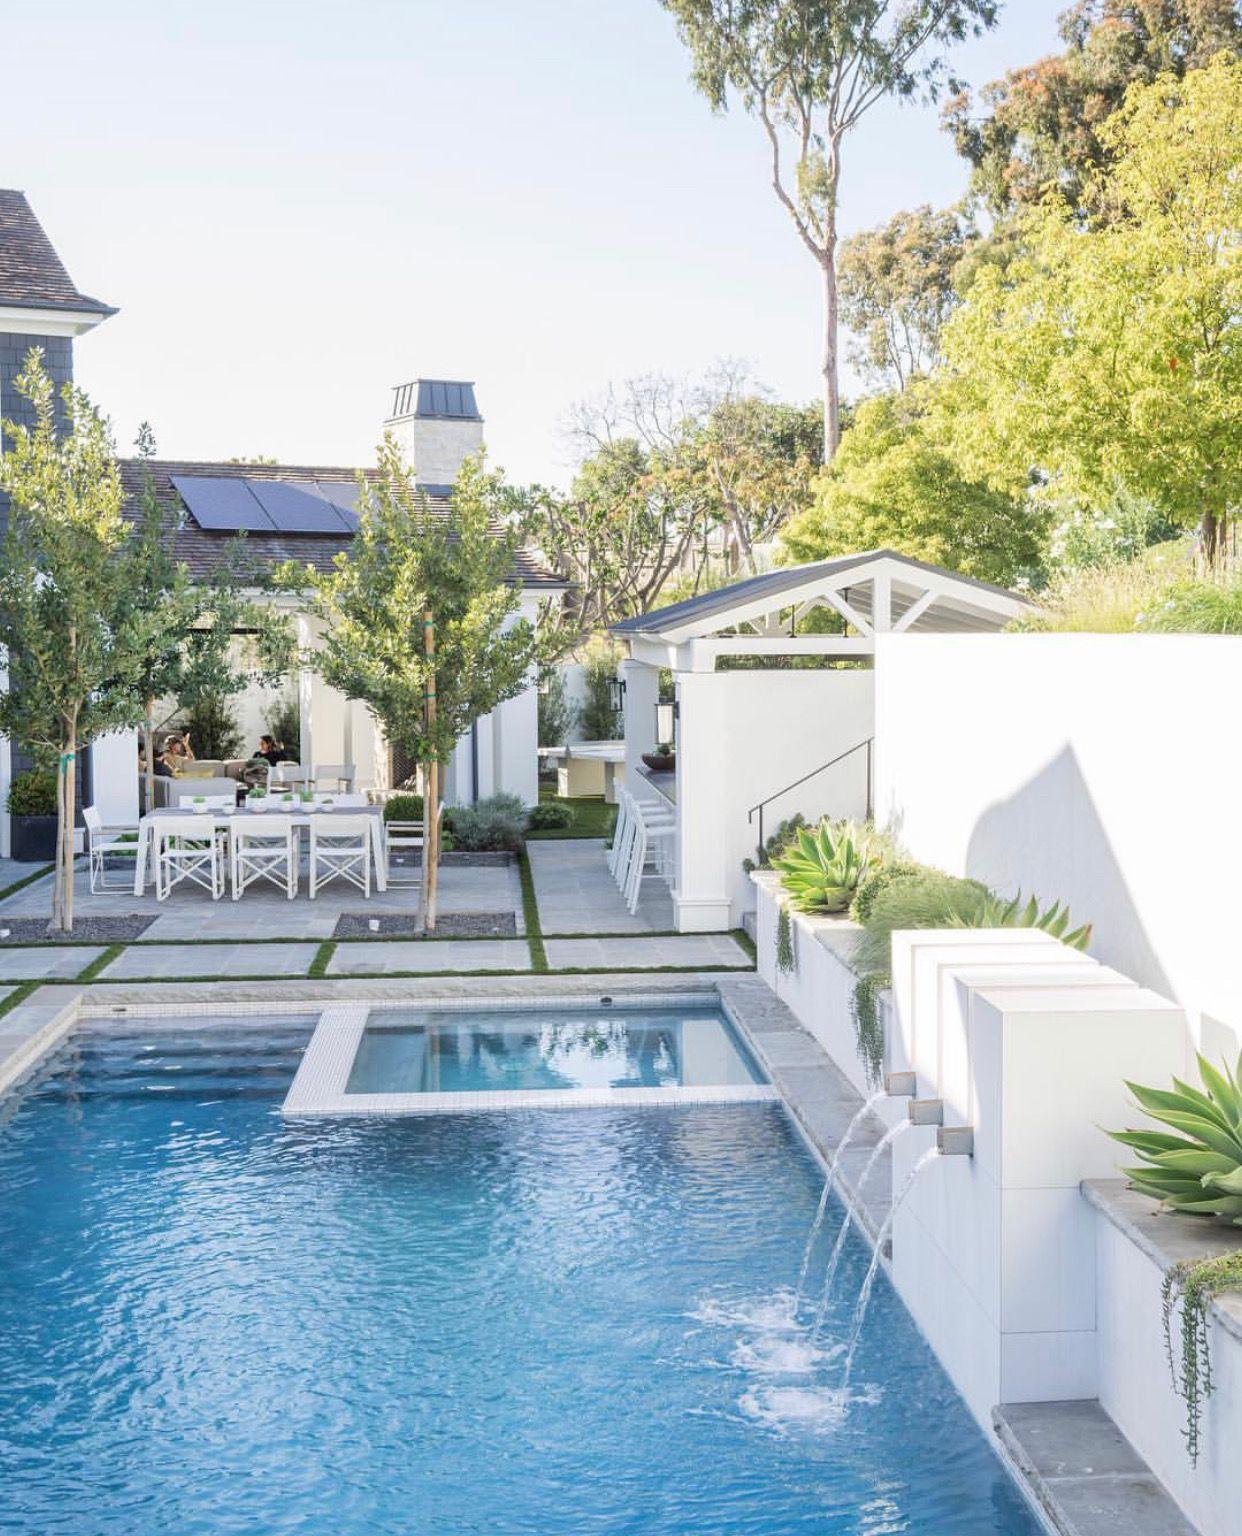 Pin by Mrs.RAH on Dream Home | Swimming pools backyard ...